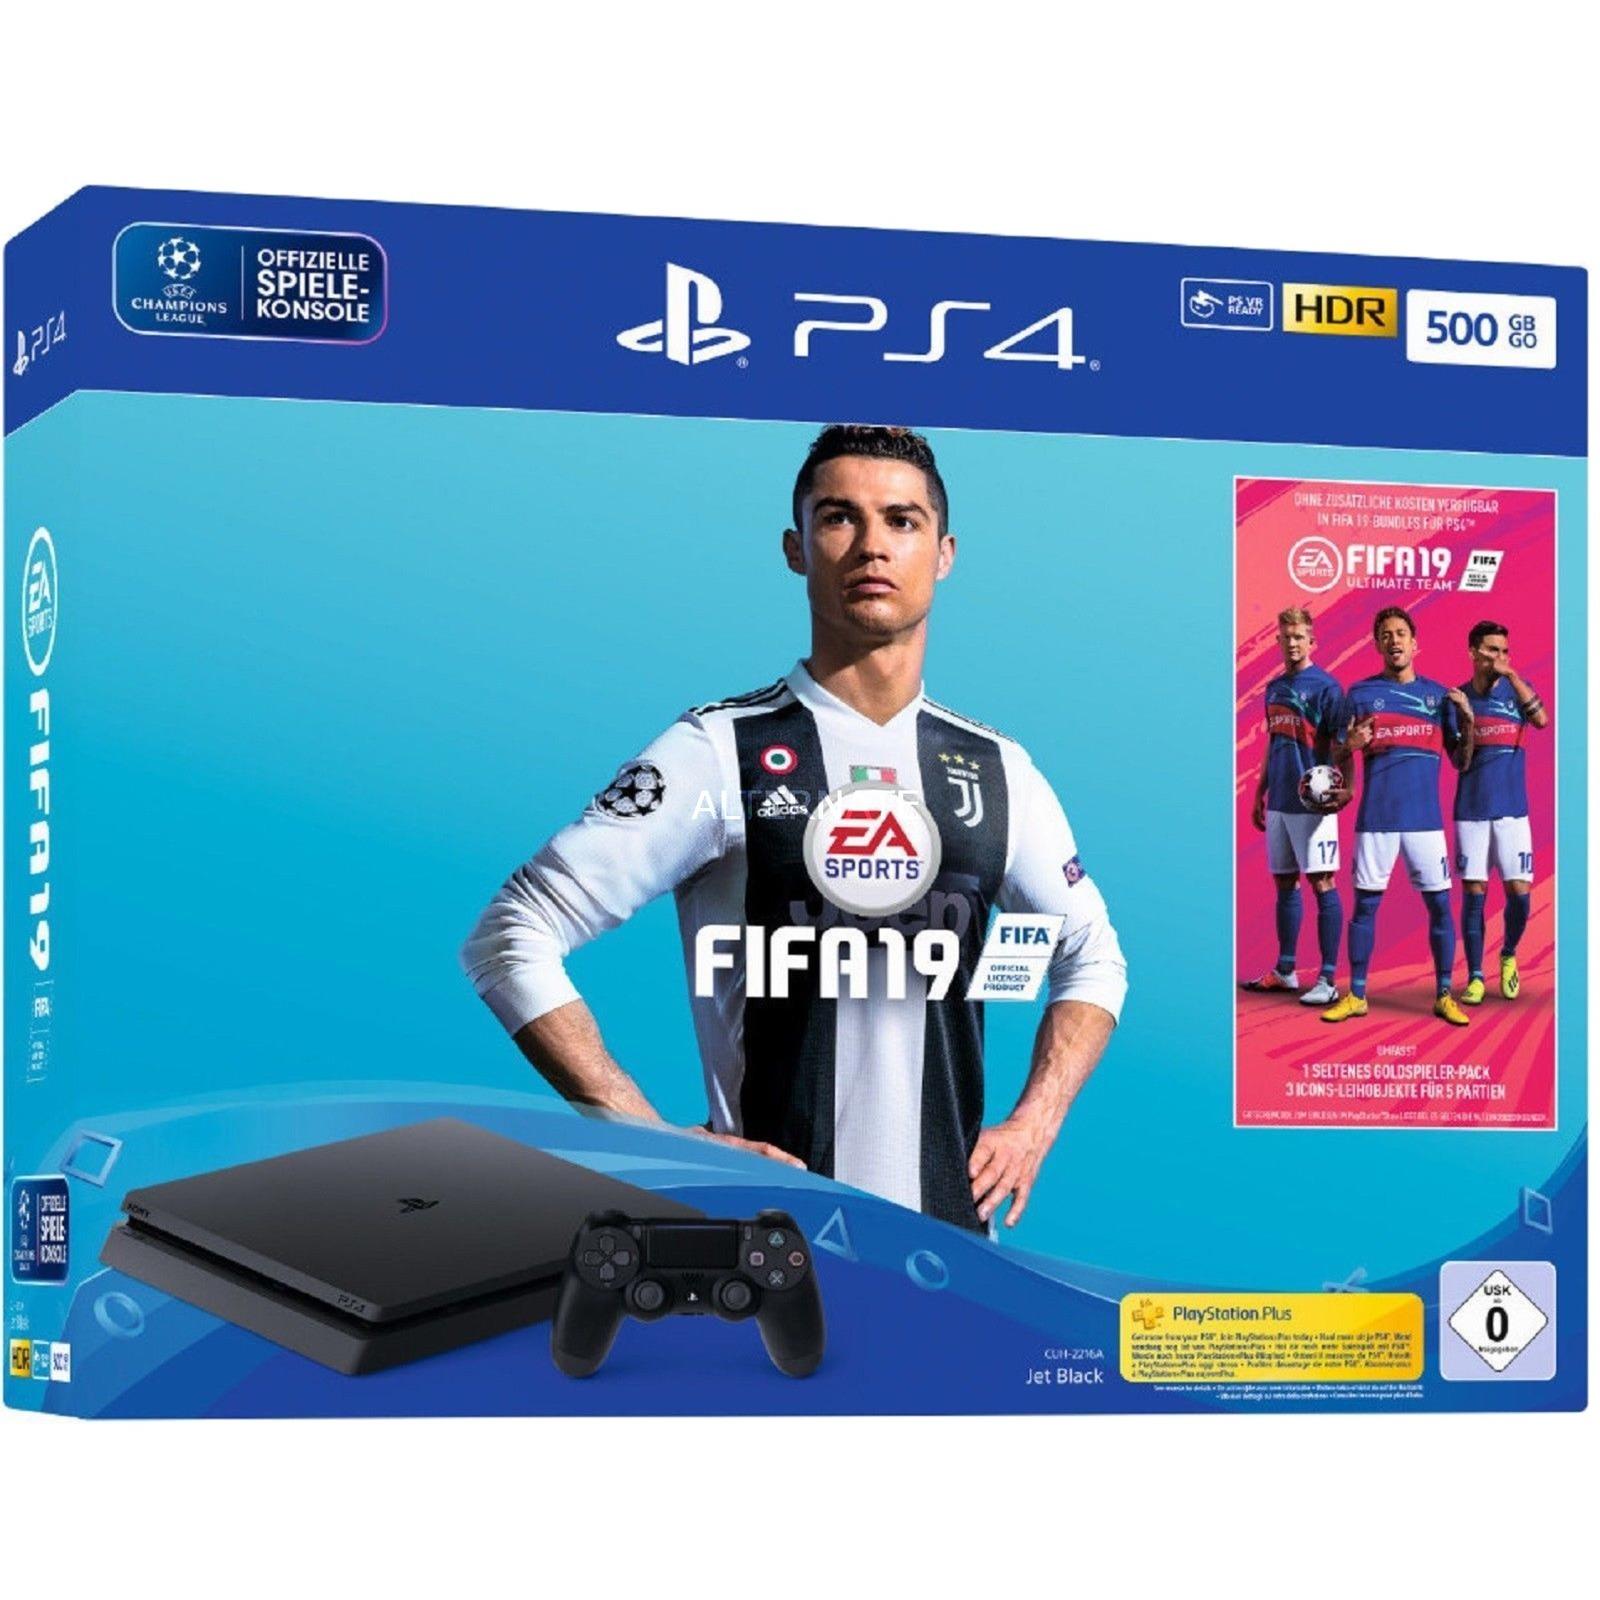 PlayStation 4 Slim 500GB + FIFA 19, Videoconsola